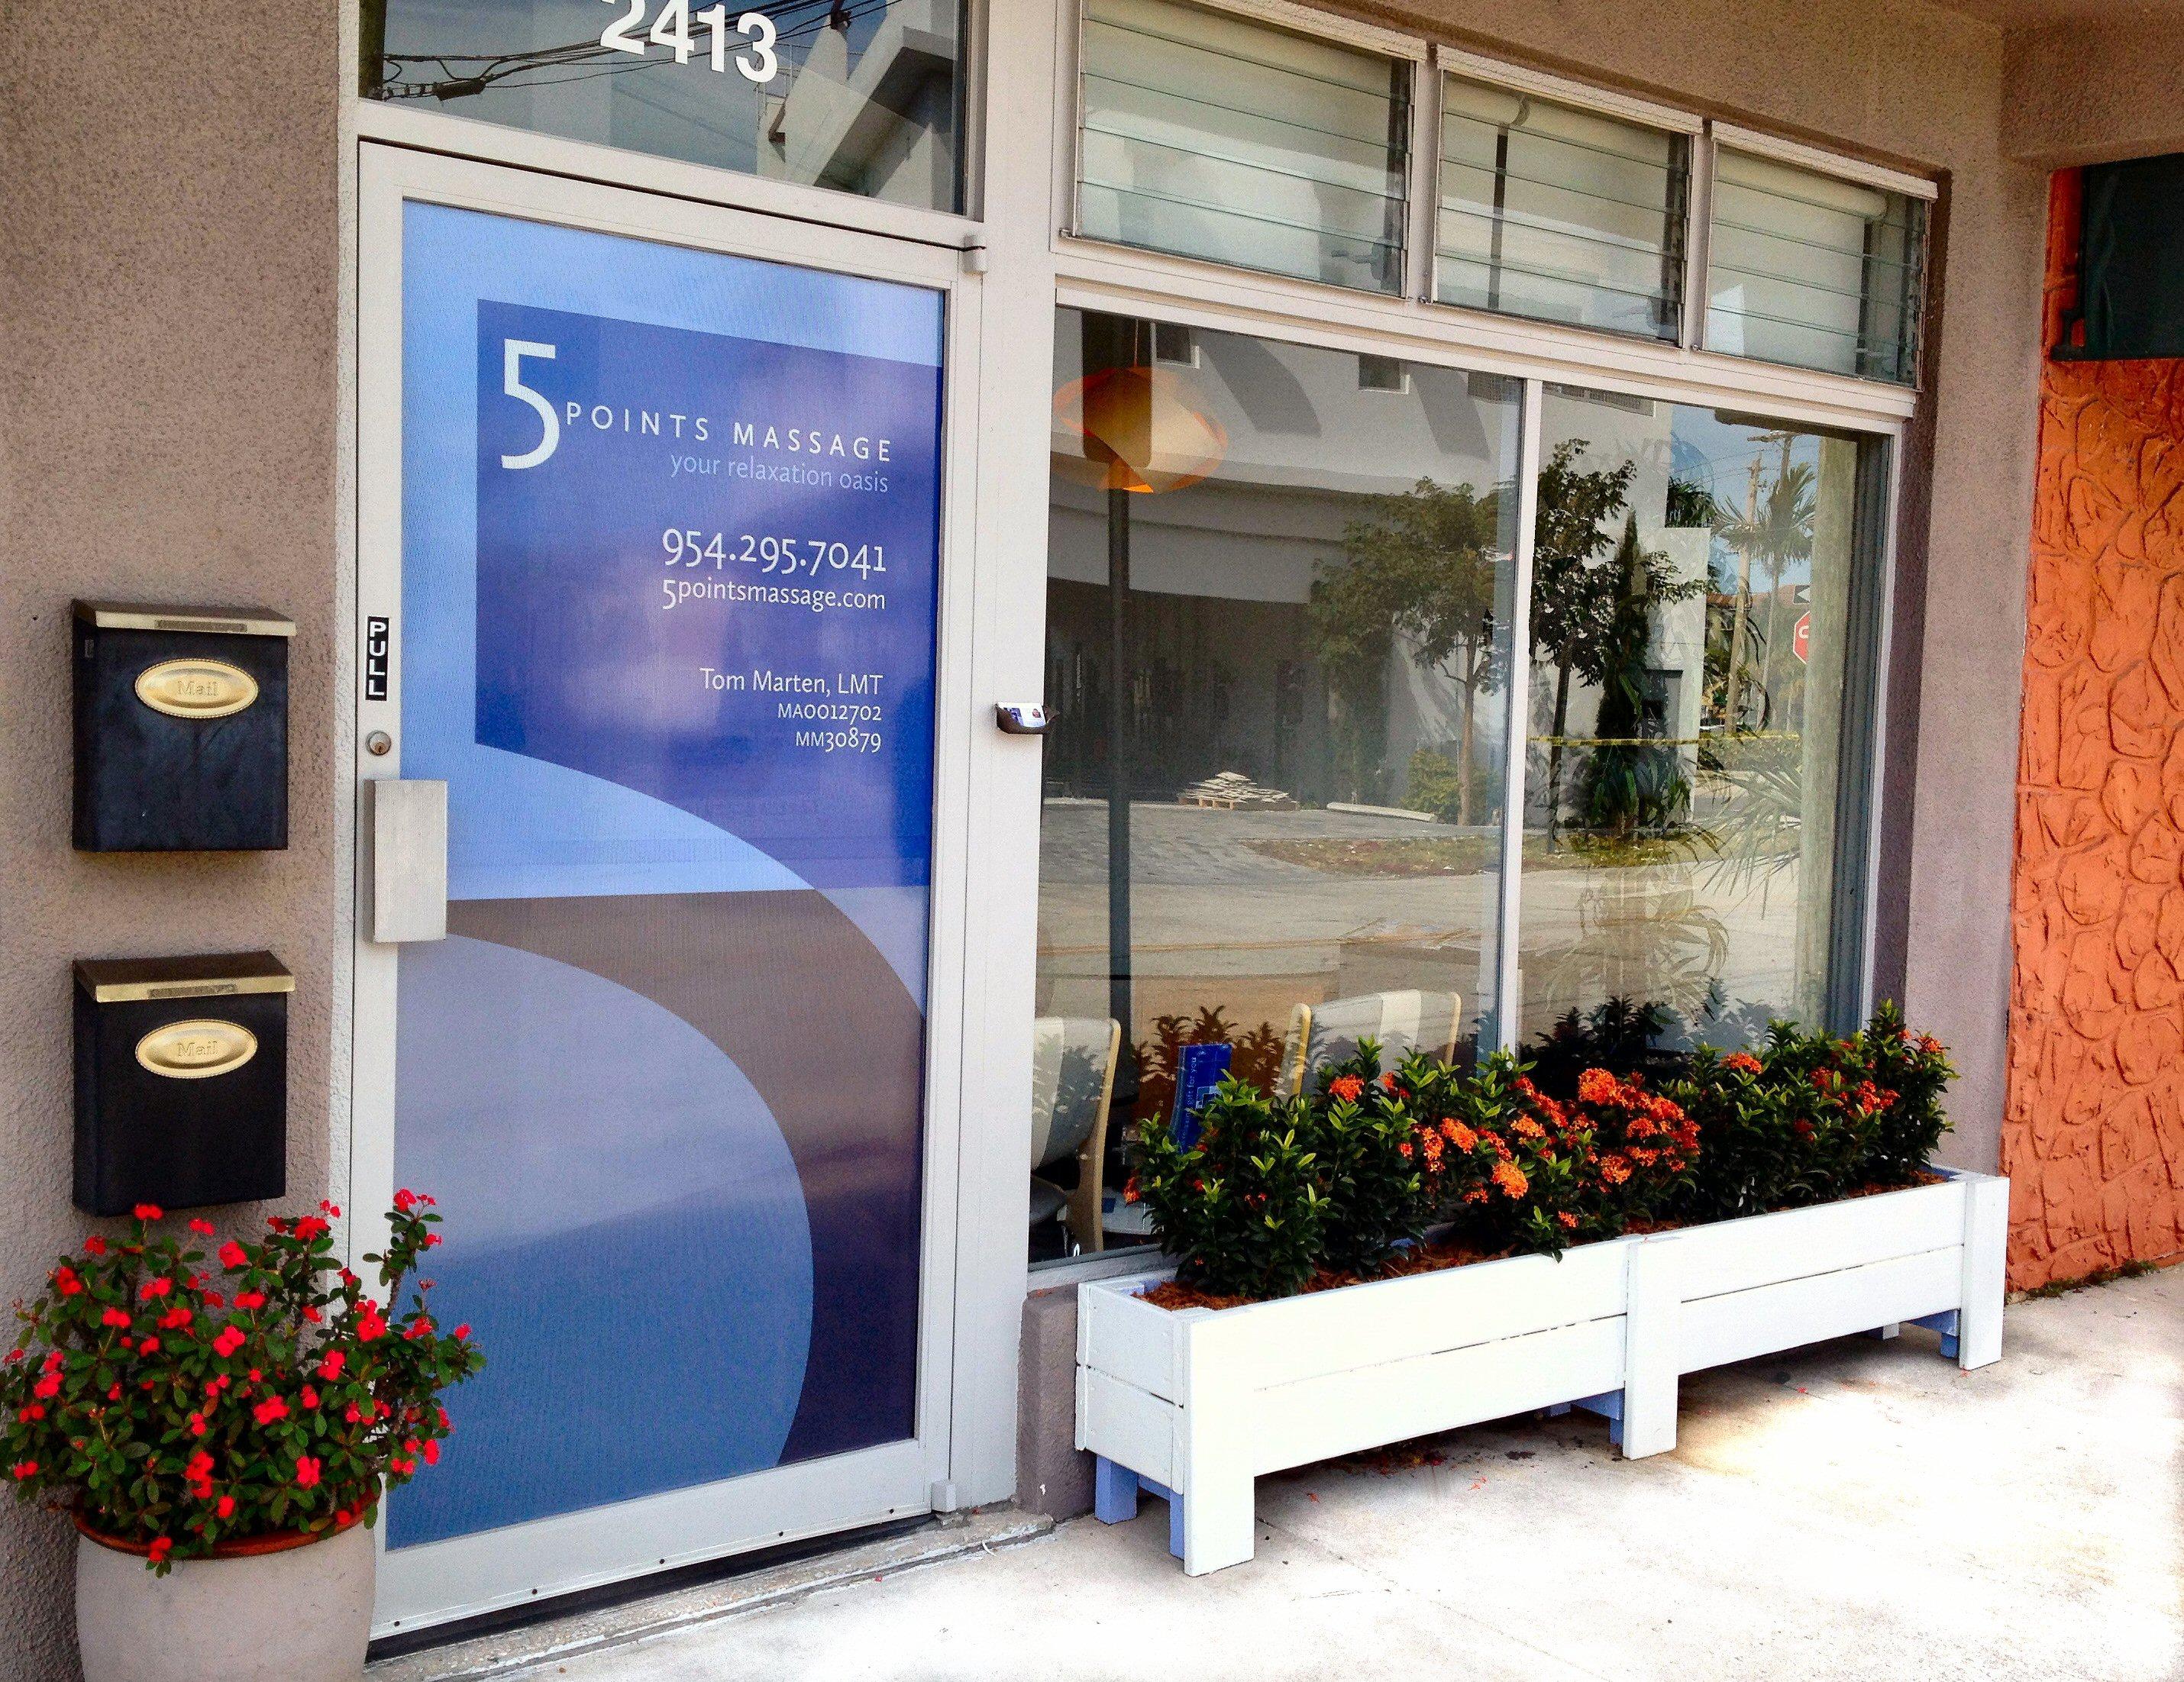 Storefront of 5 Points Massage Studio